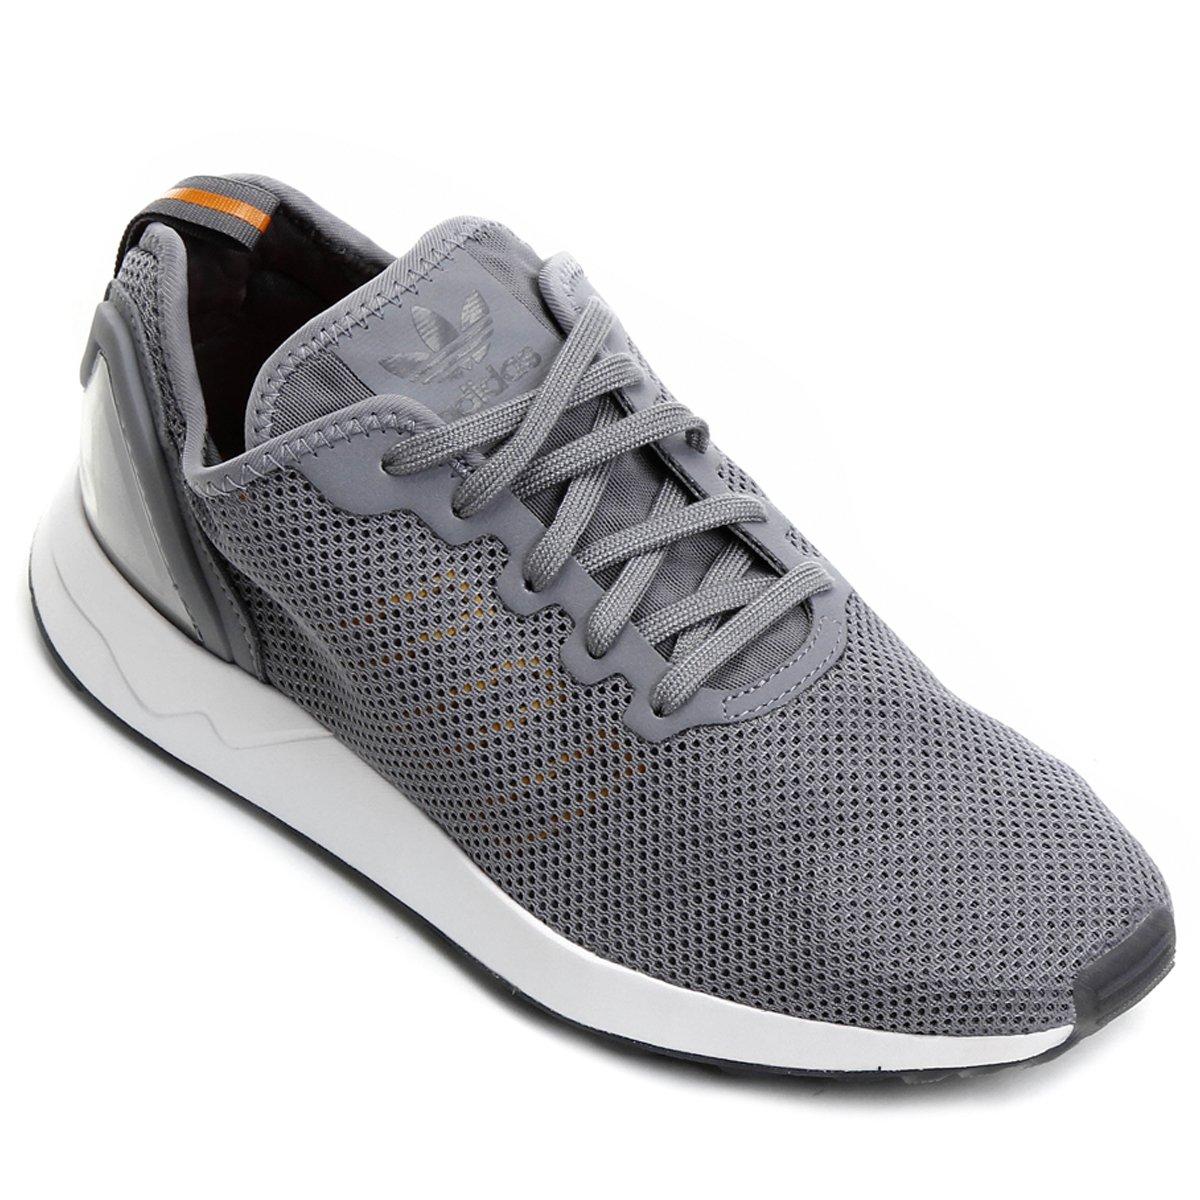 df565f1d3 ... greece tênis adidas zx flux adv racer sl compre agora netshoes d7e54  1f085